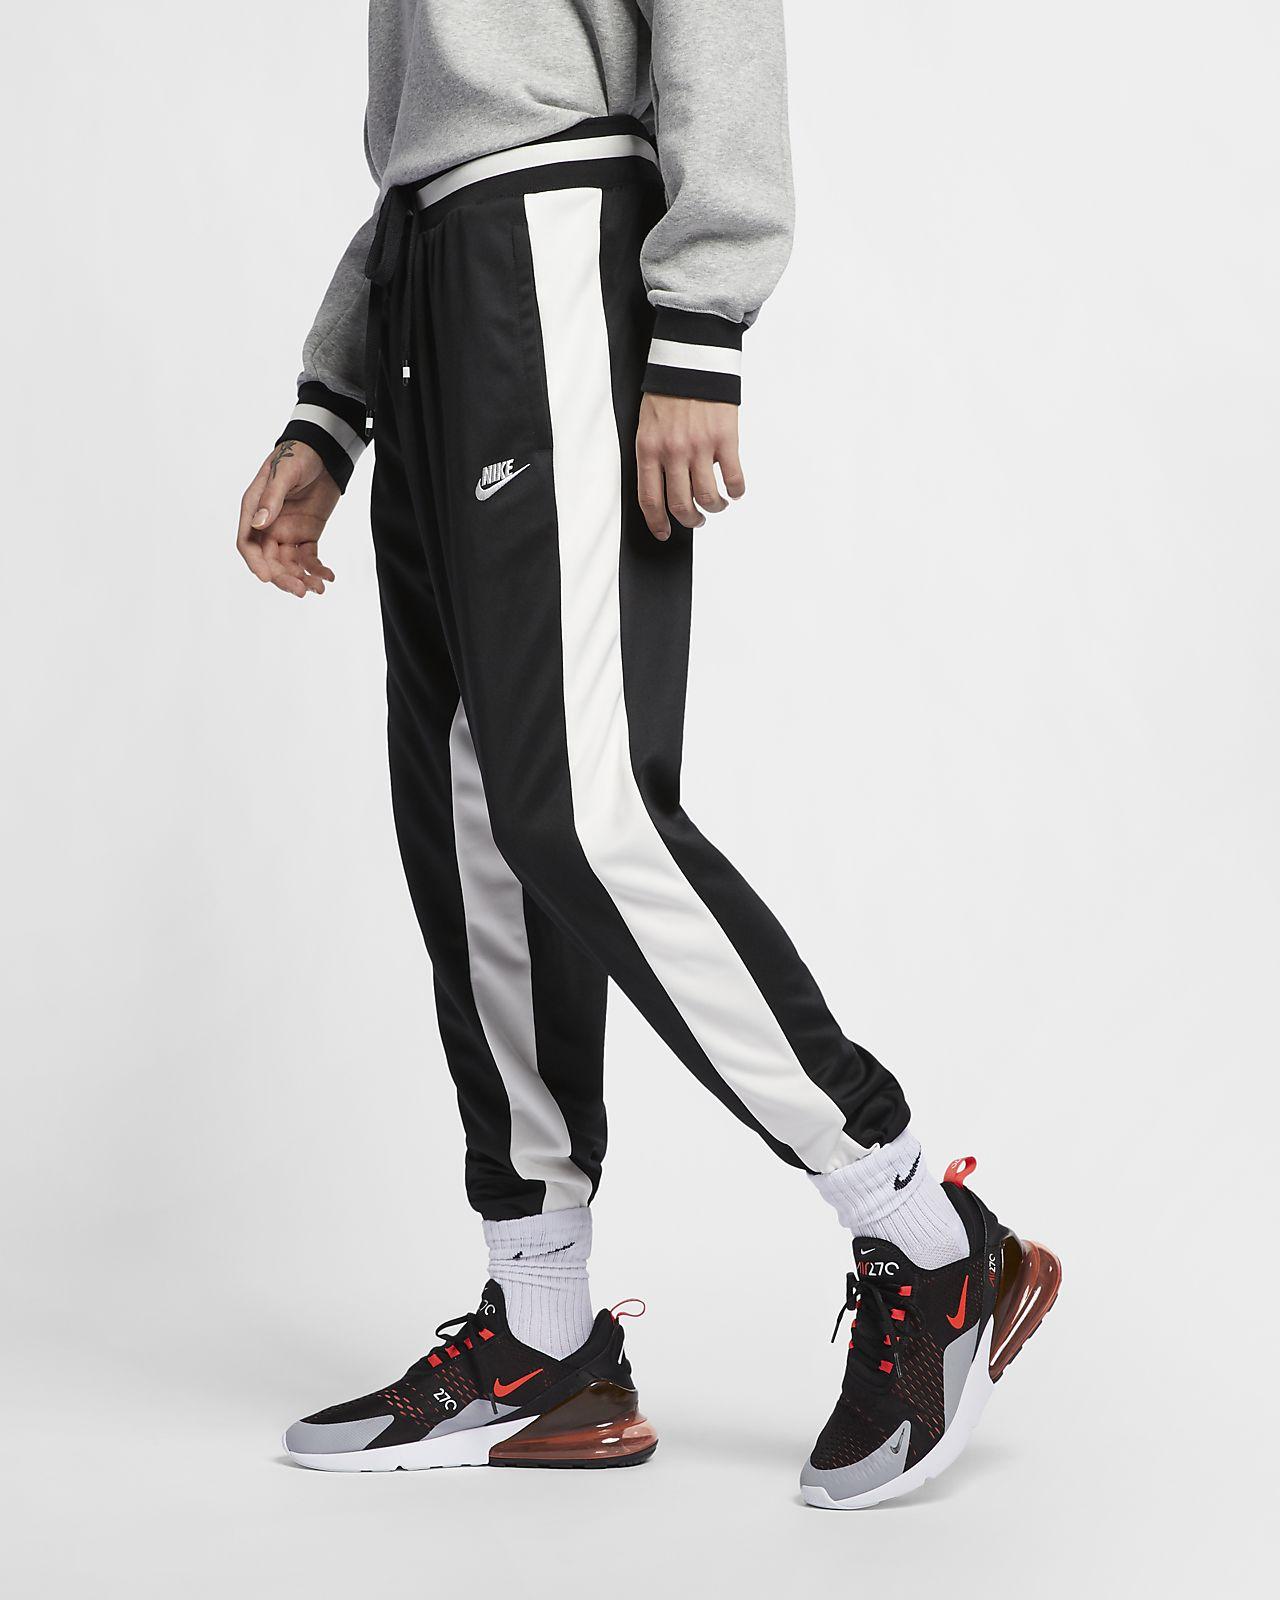 pantalon nike homme sportswear